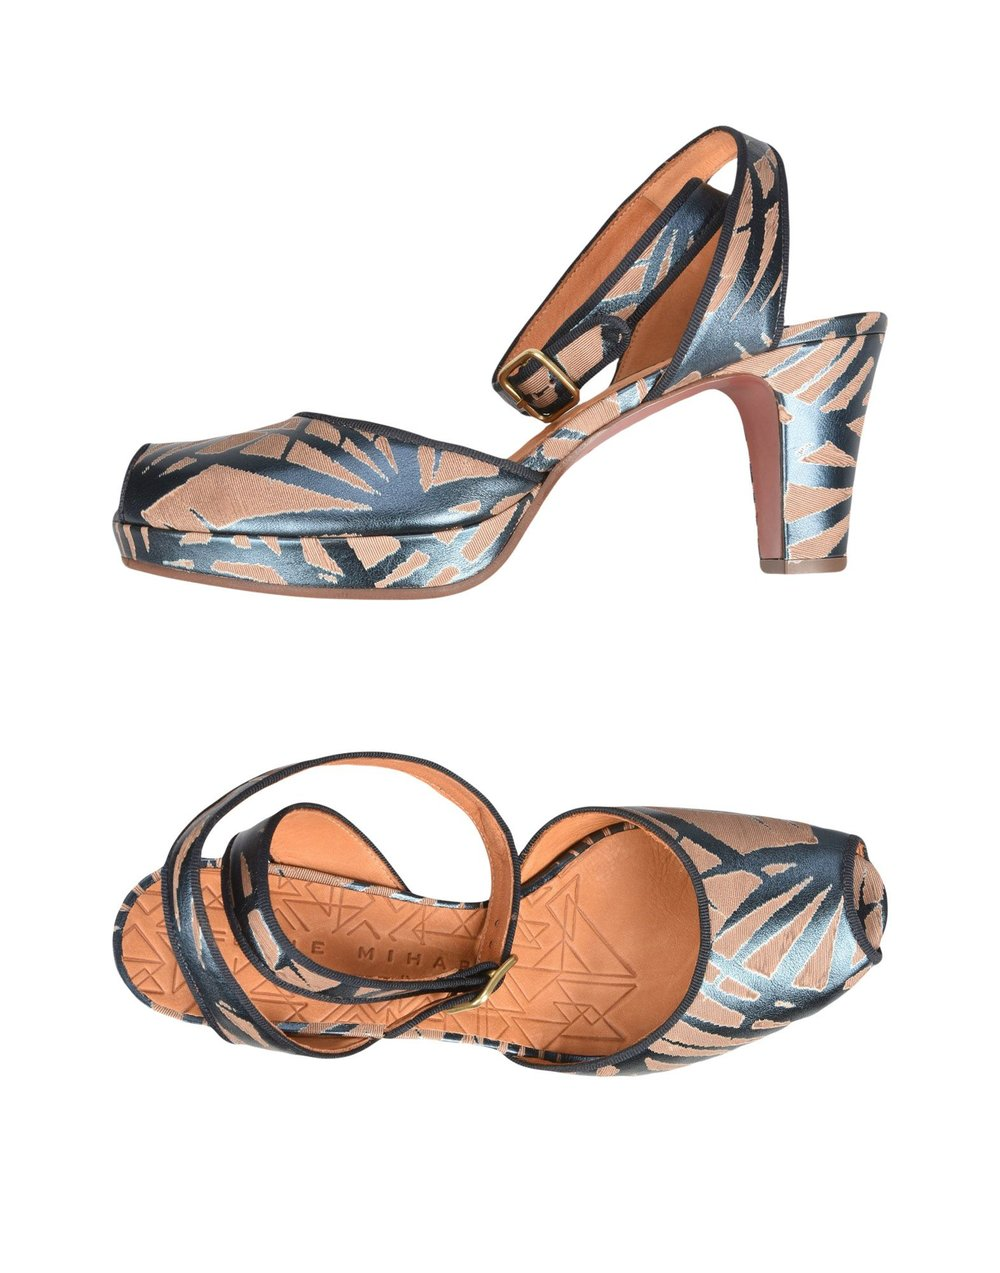 Sandals. Yoox. $353.